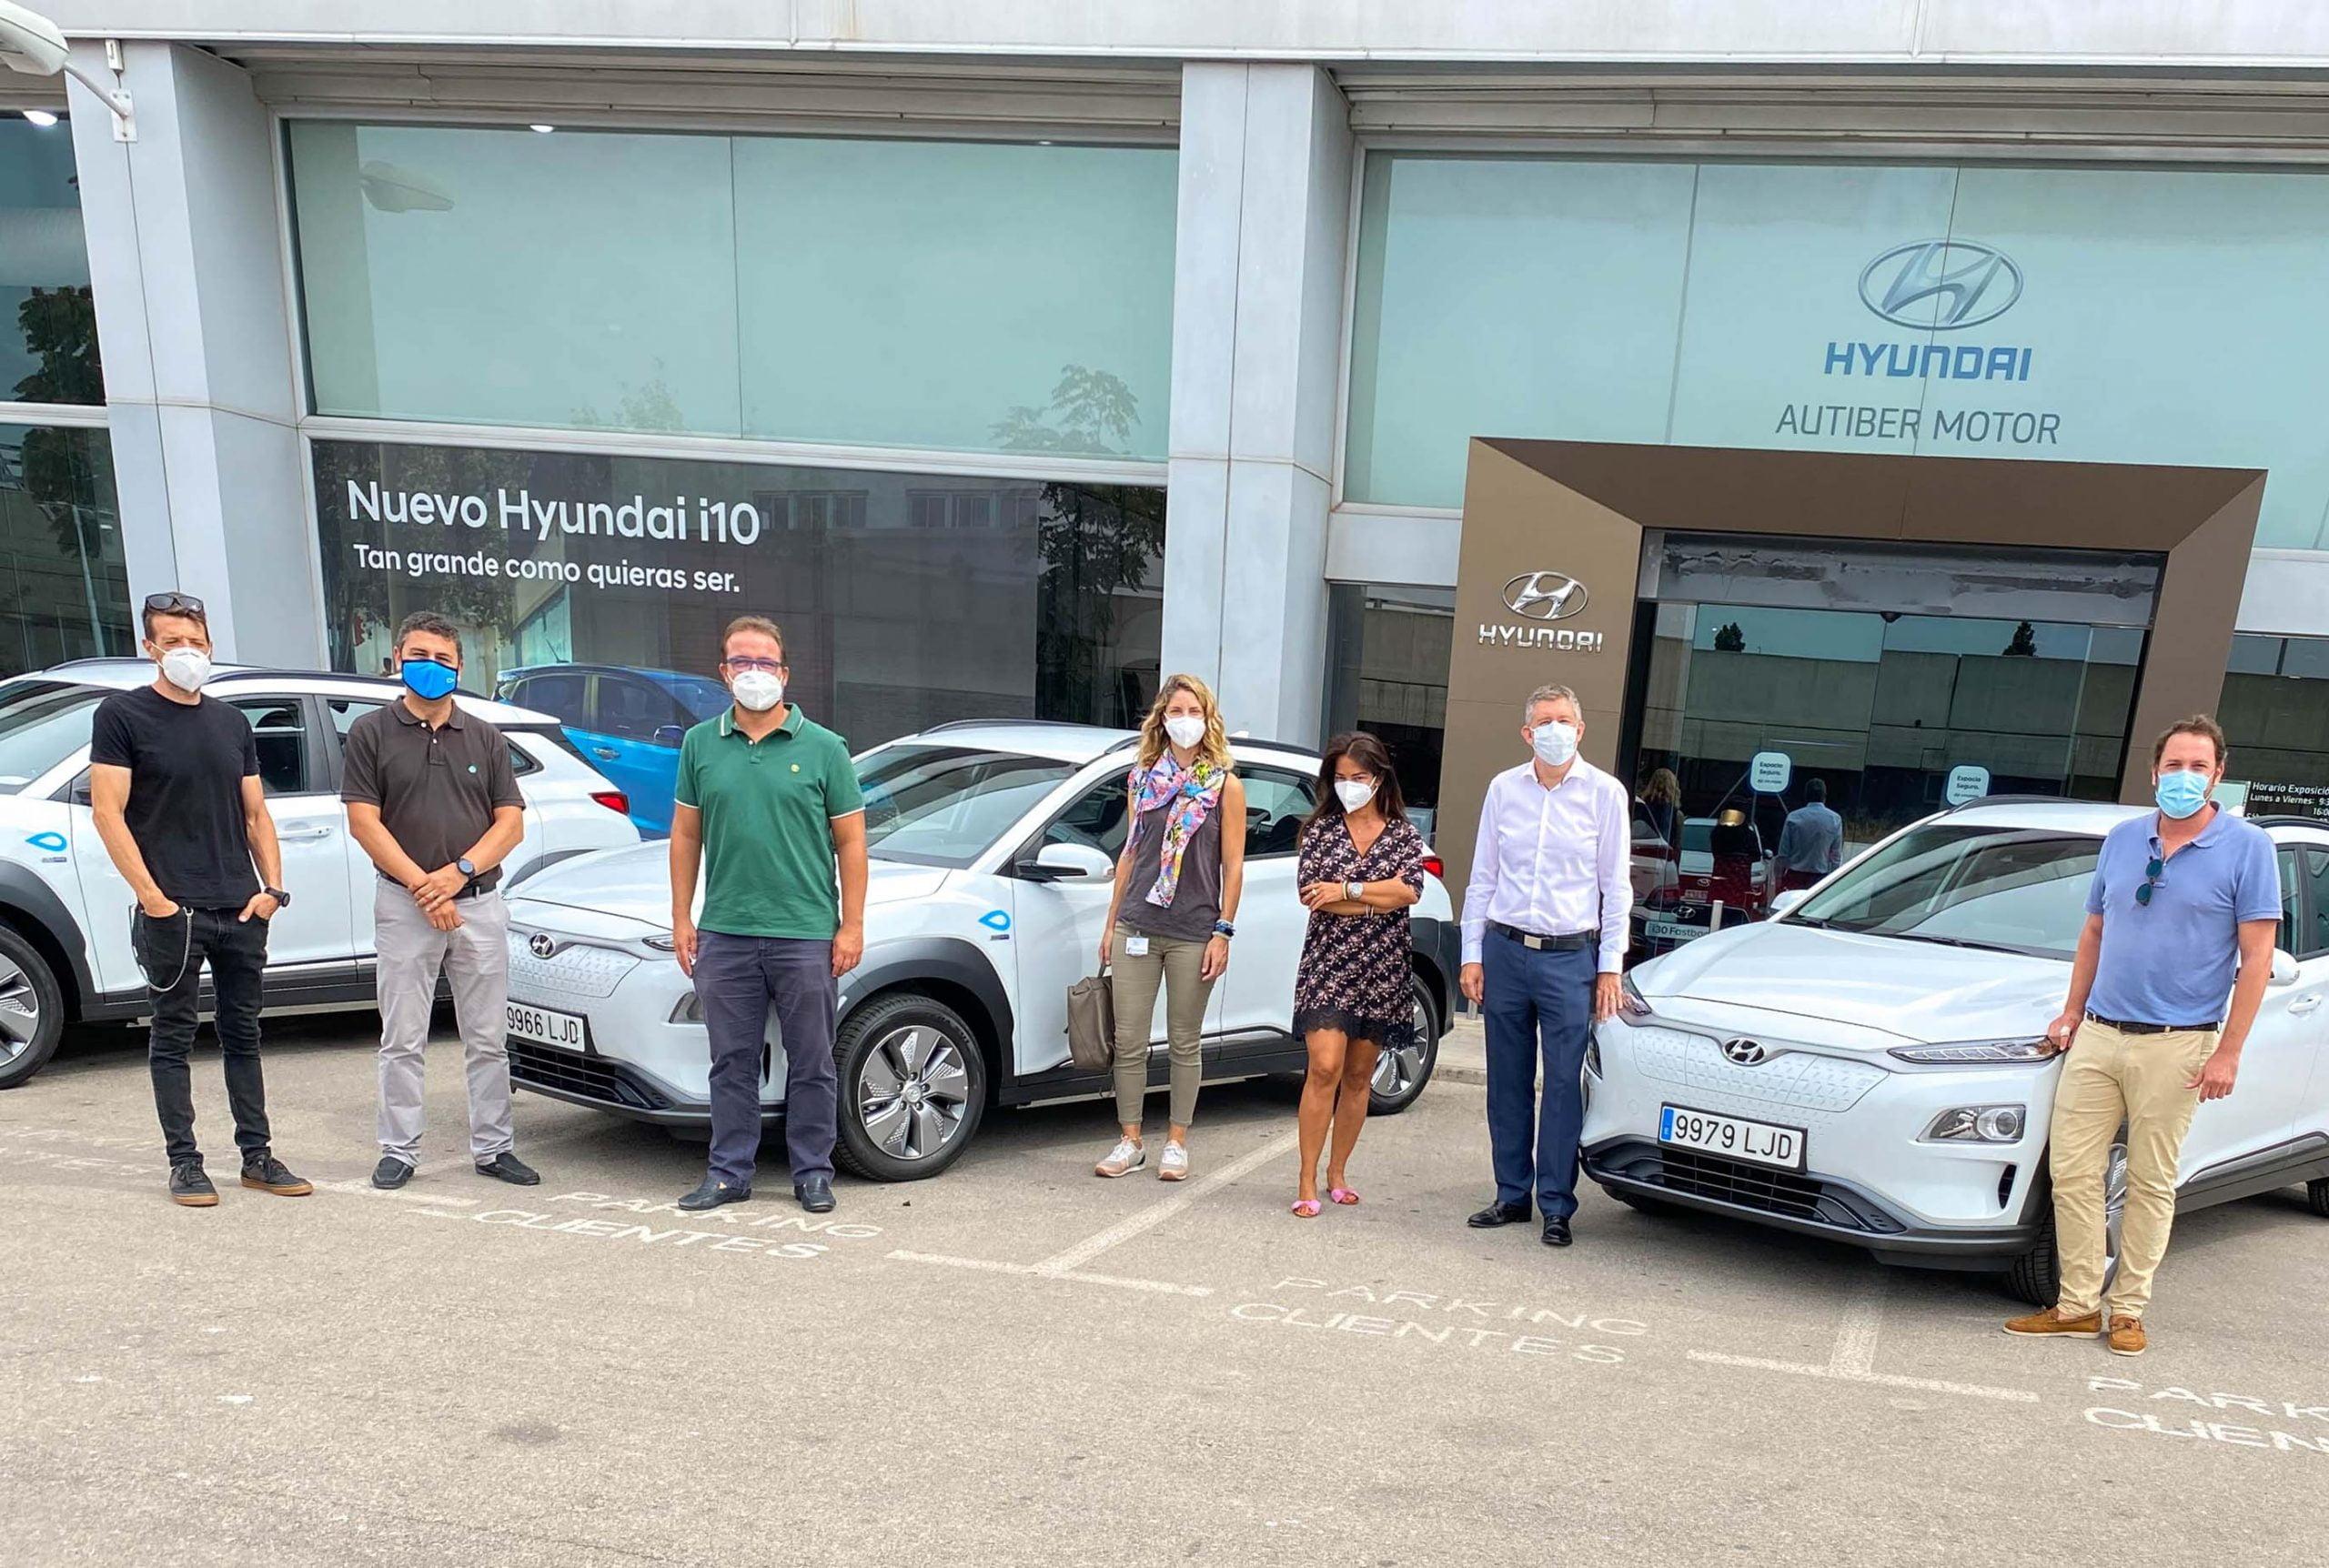 Imagen destacada Global Omnium incorpora vehículos ecológicos a su flota de turismos